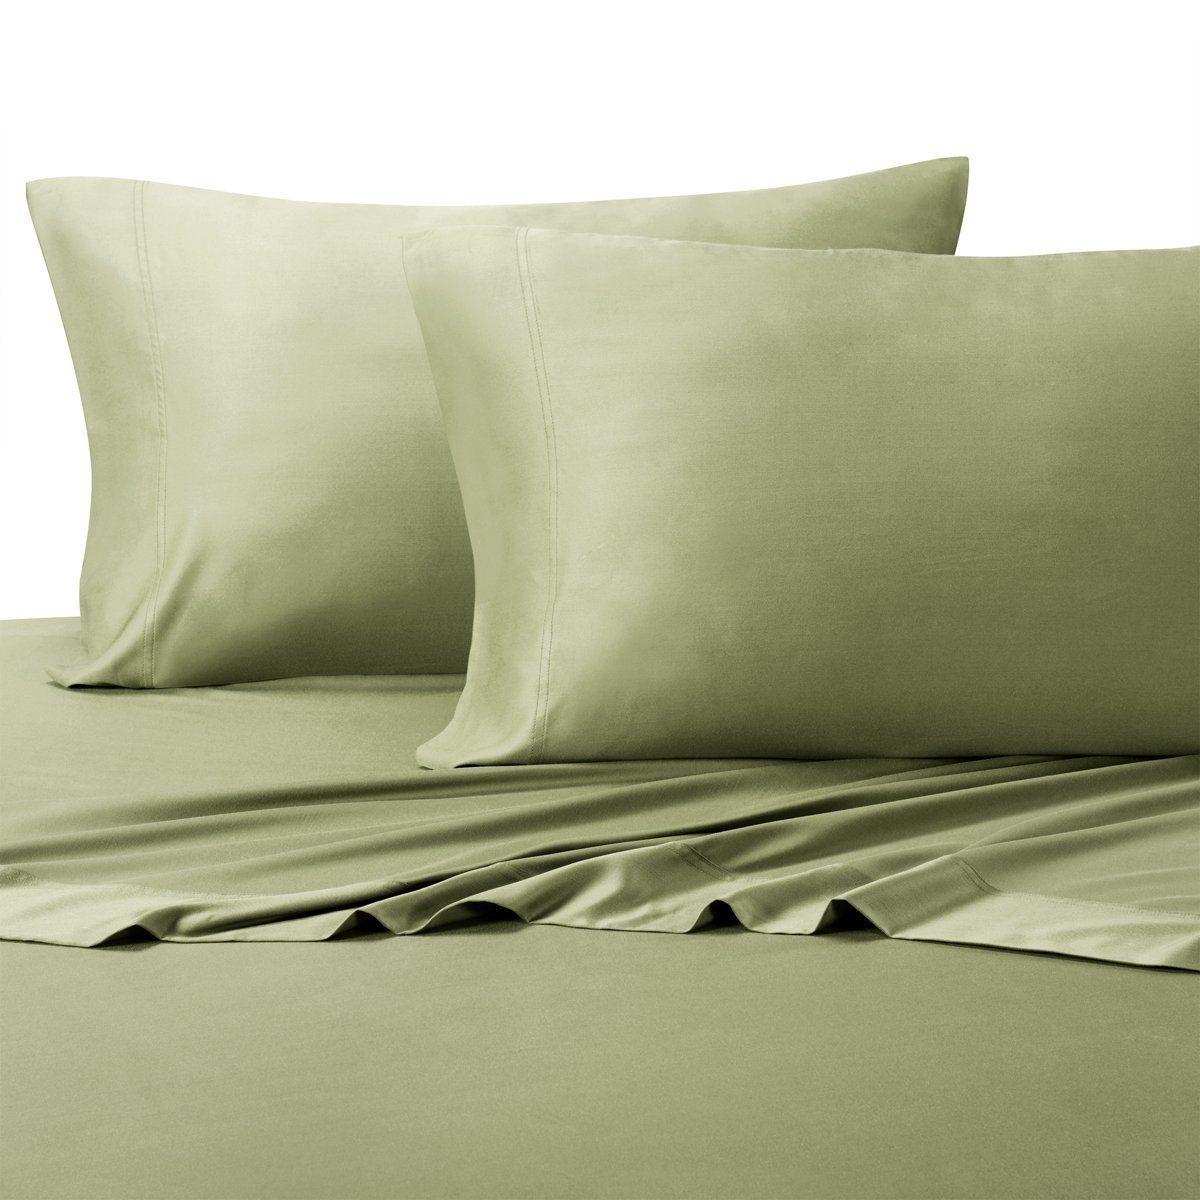 Eucalyptus sheets!